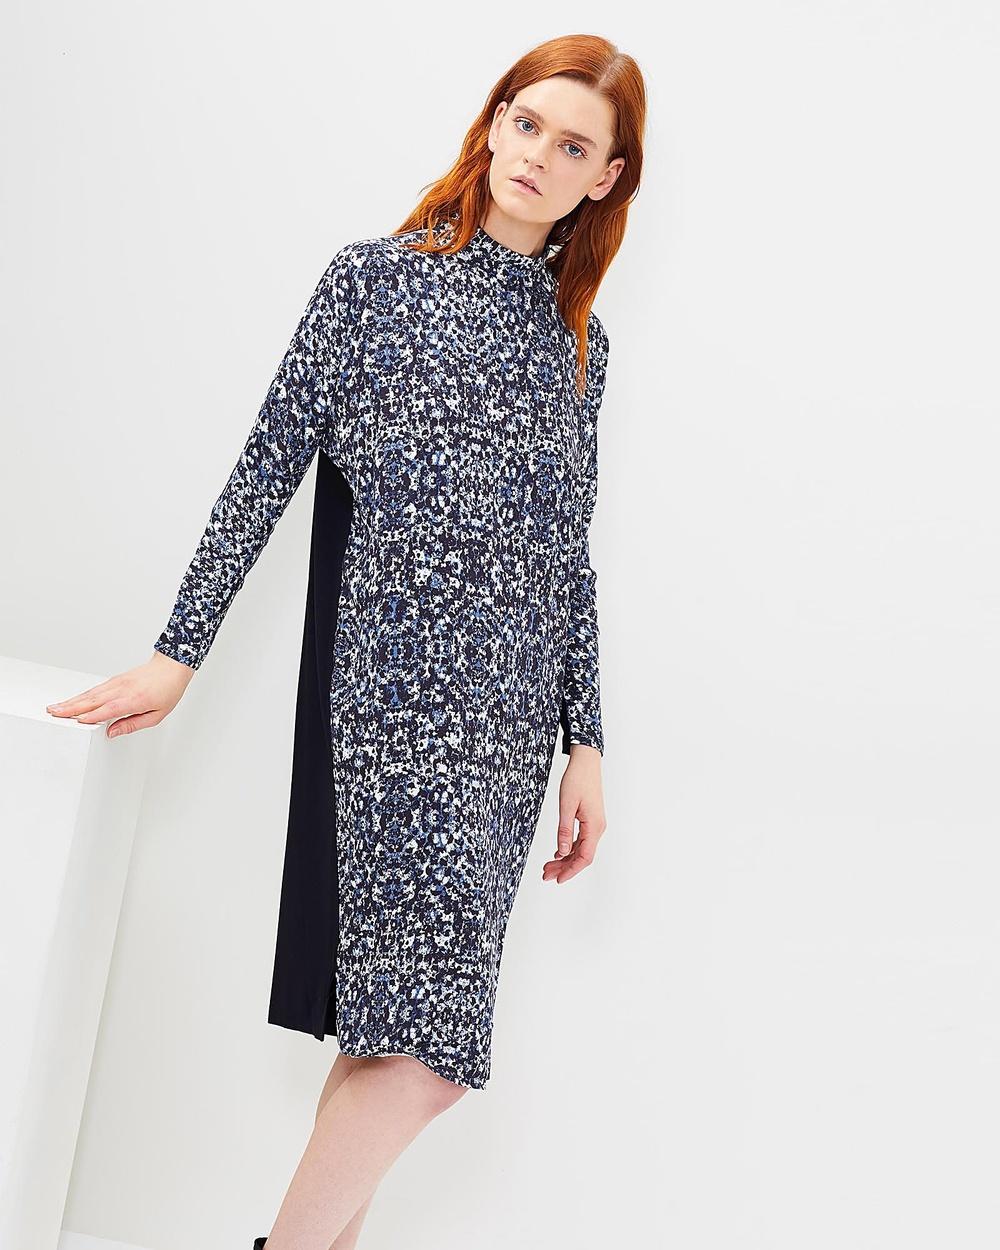 SABA Seafoam Dress Printed Dresses Multi Seafoam Dress